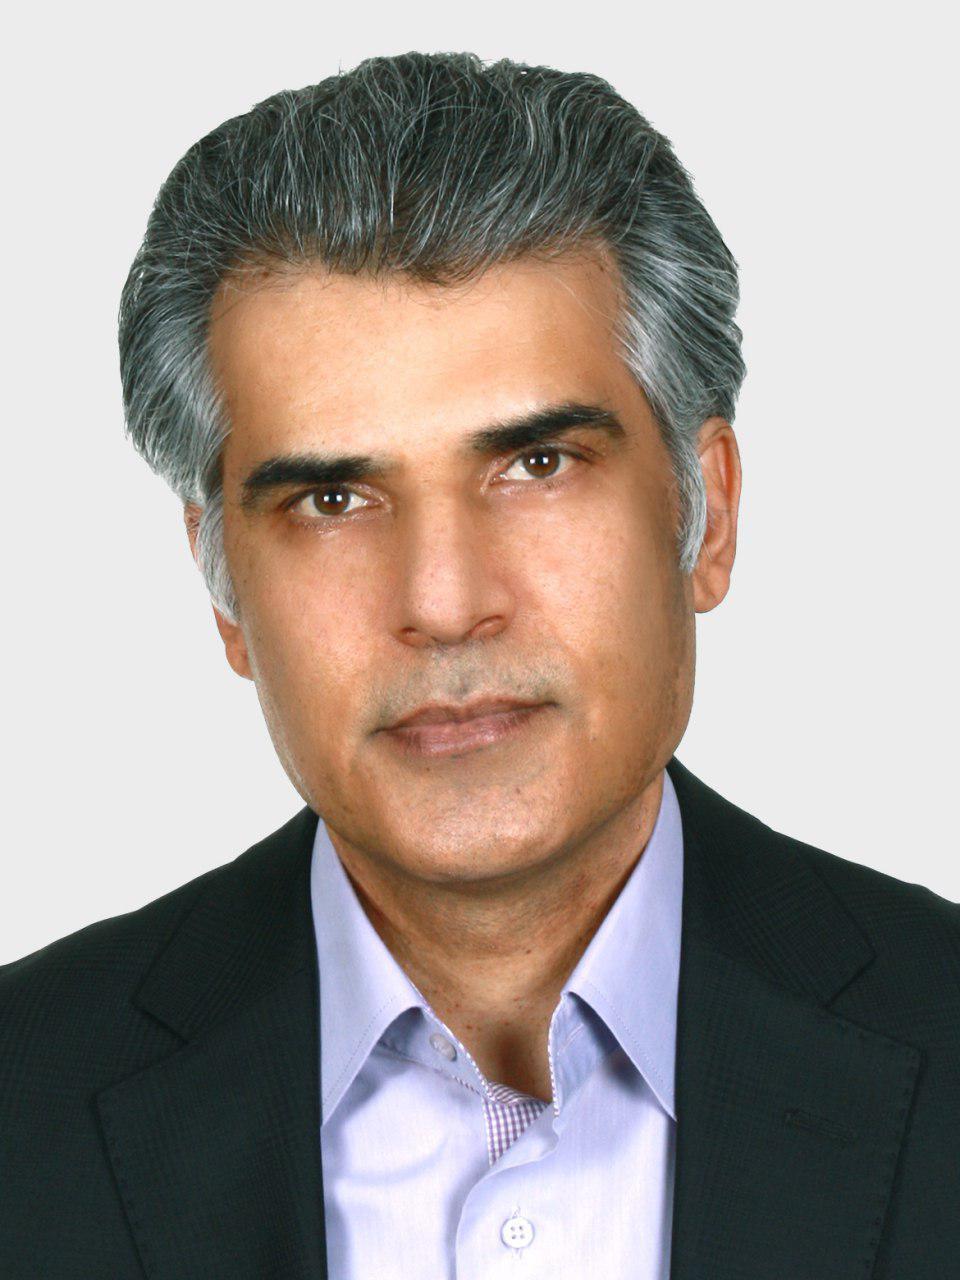 محمدرضا برزگری بافقی